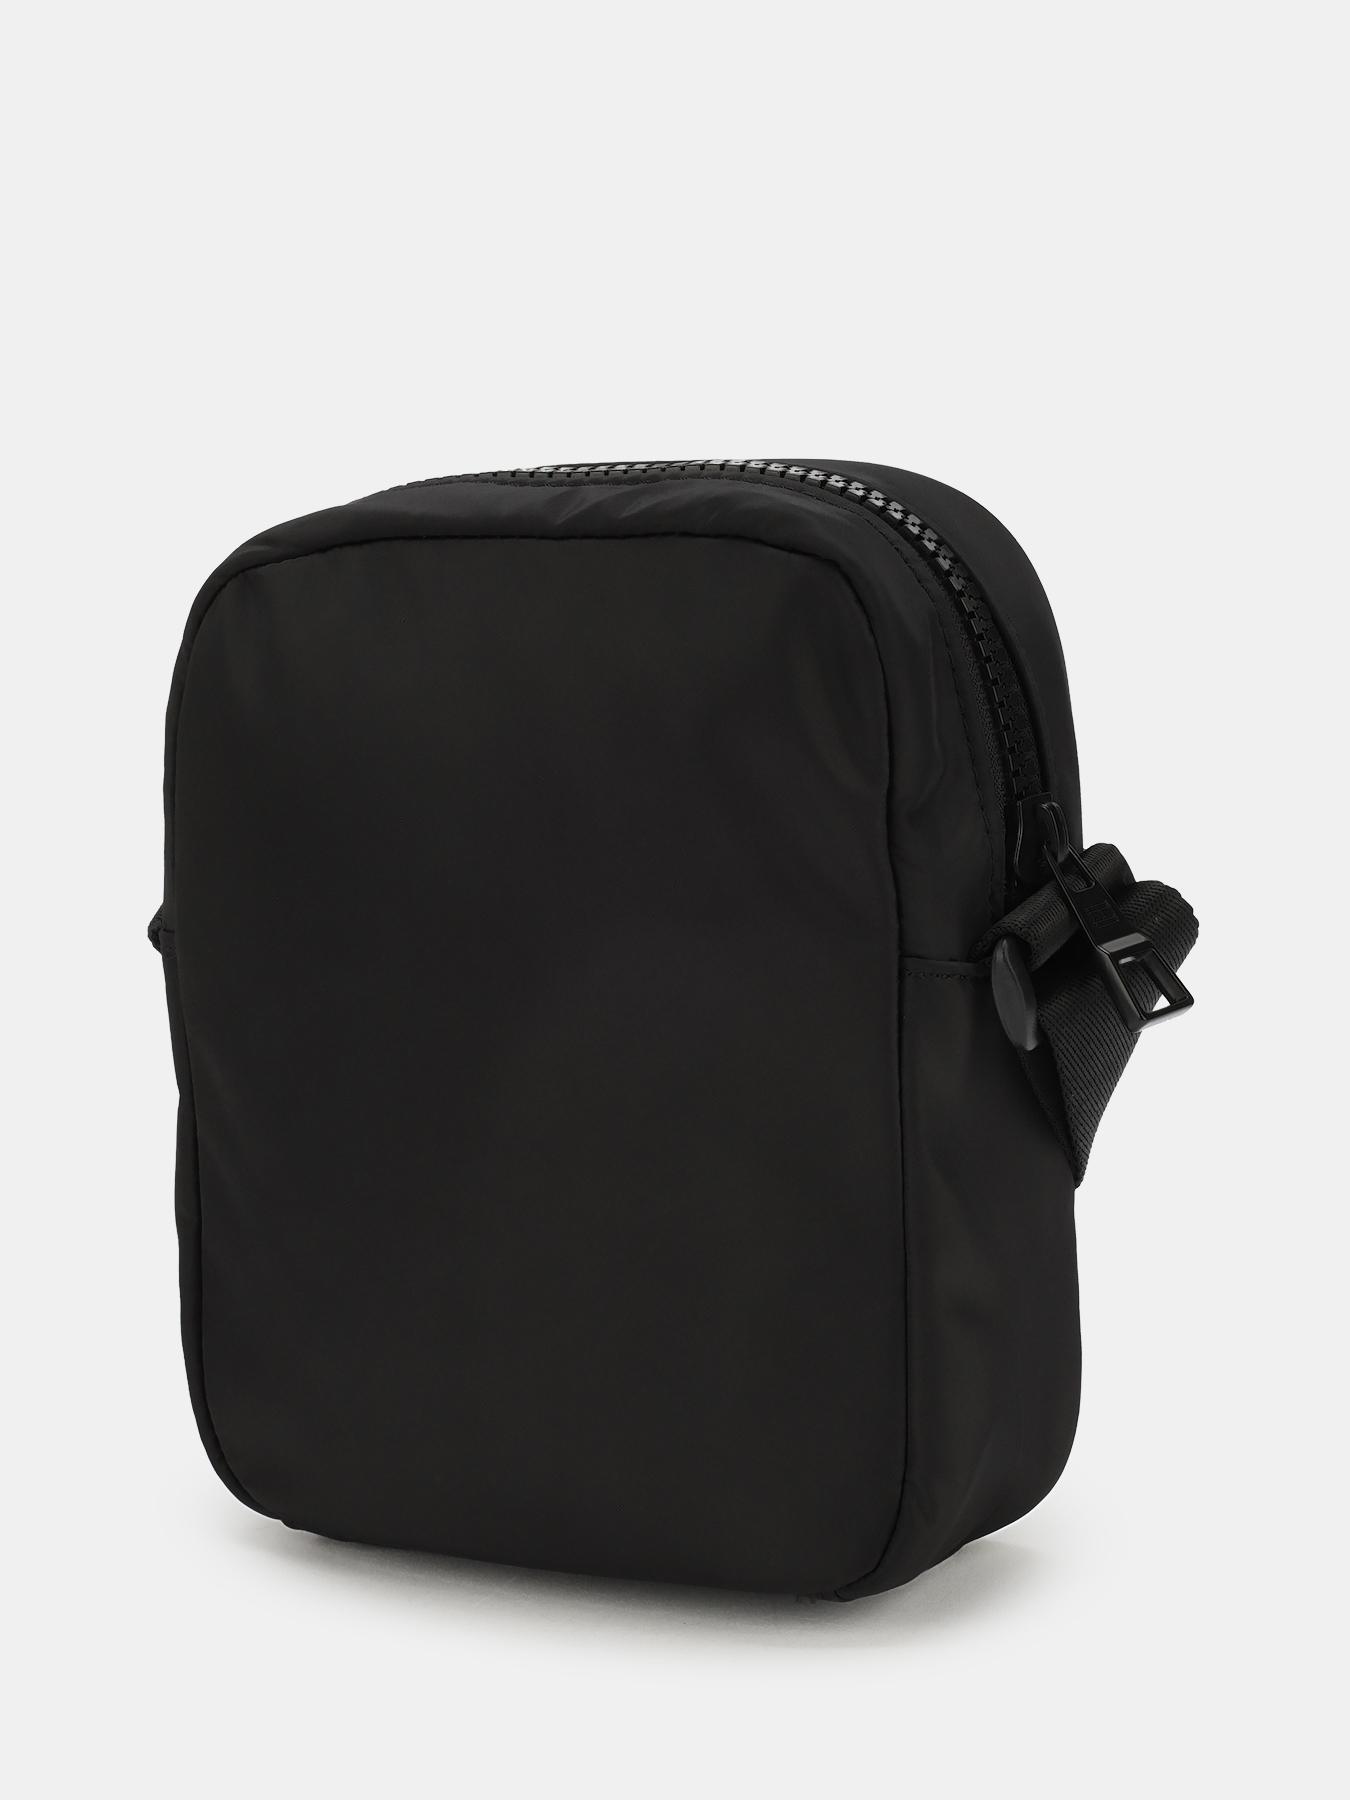 Сумка Tommy Hilfiger Сумка сумка renee kler сумка